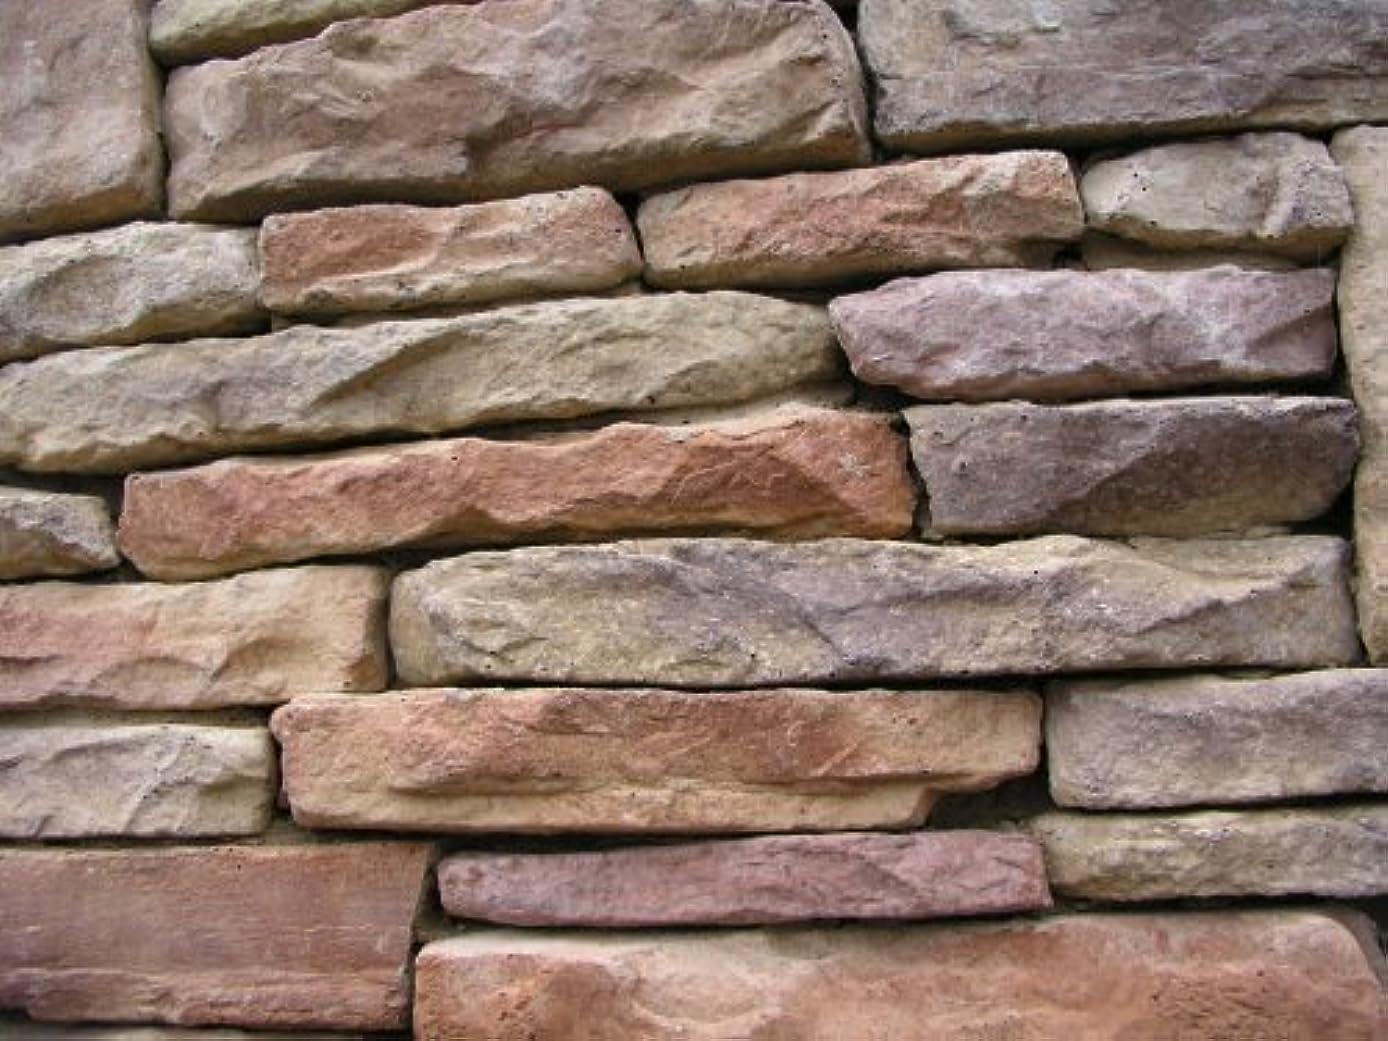 1 Set of 16 Molds to Make Drystack Ledgestone Rocks, ODL-02